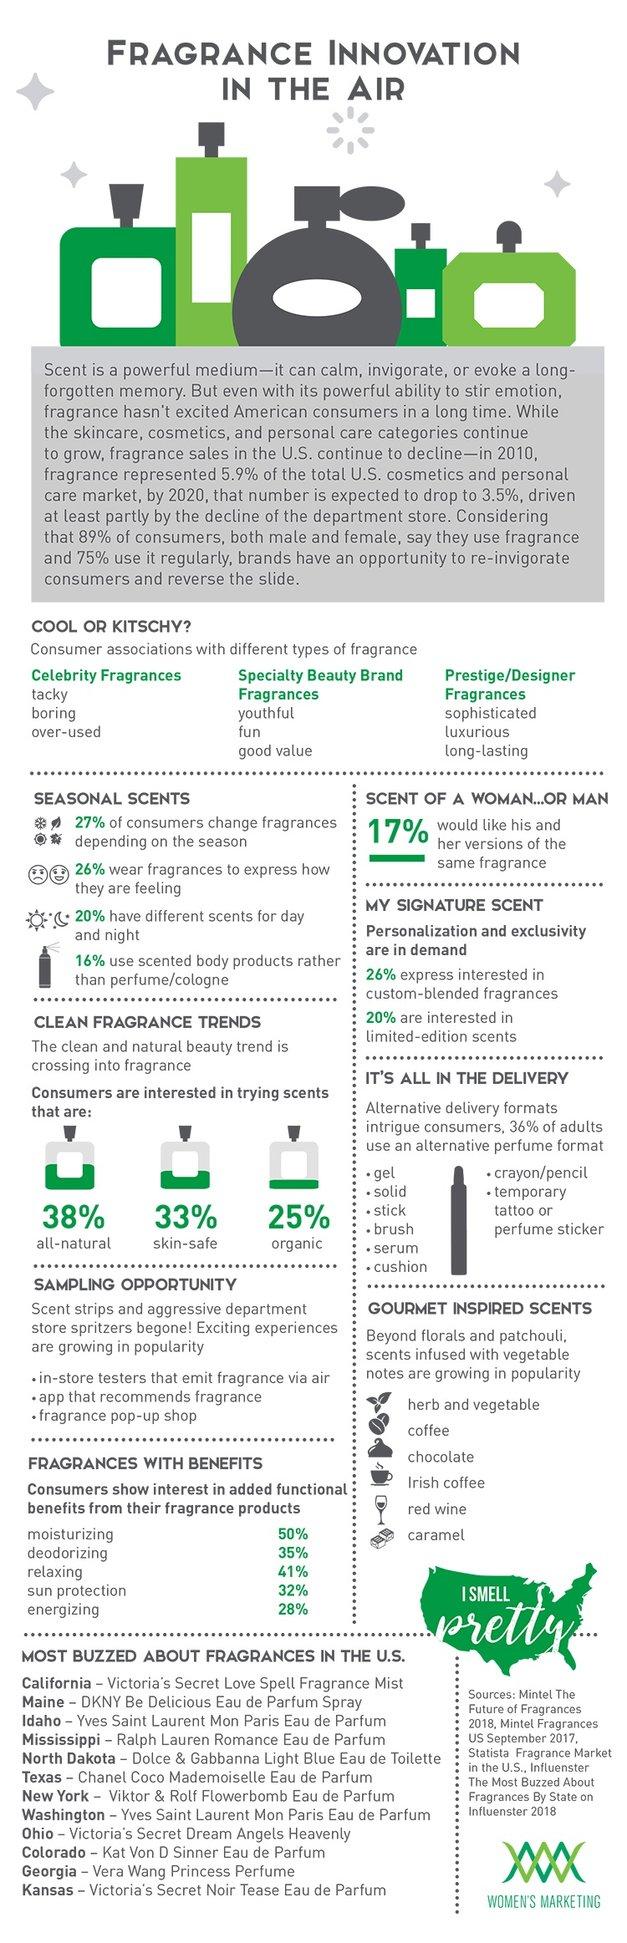 FragranceInnovation_Infographic.jpg